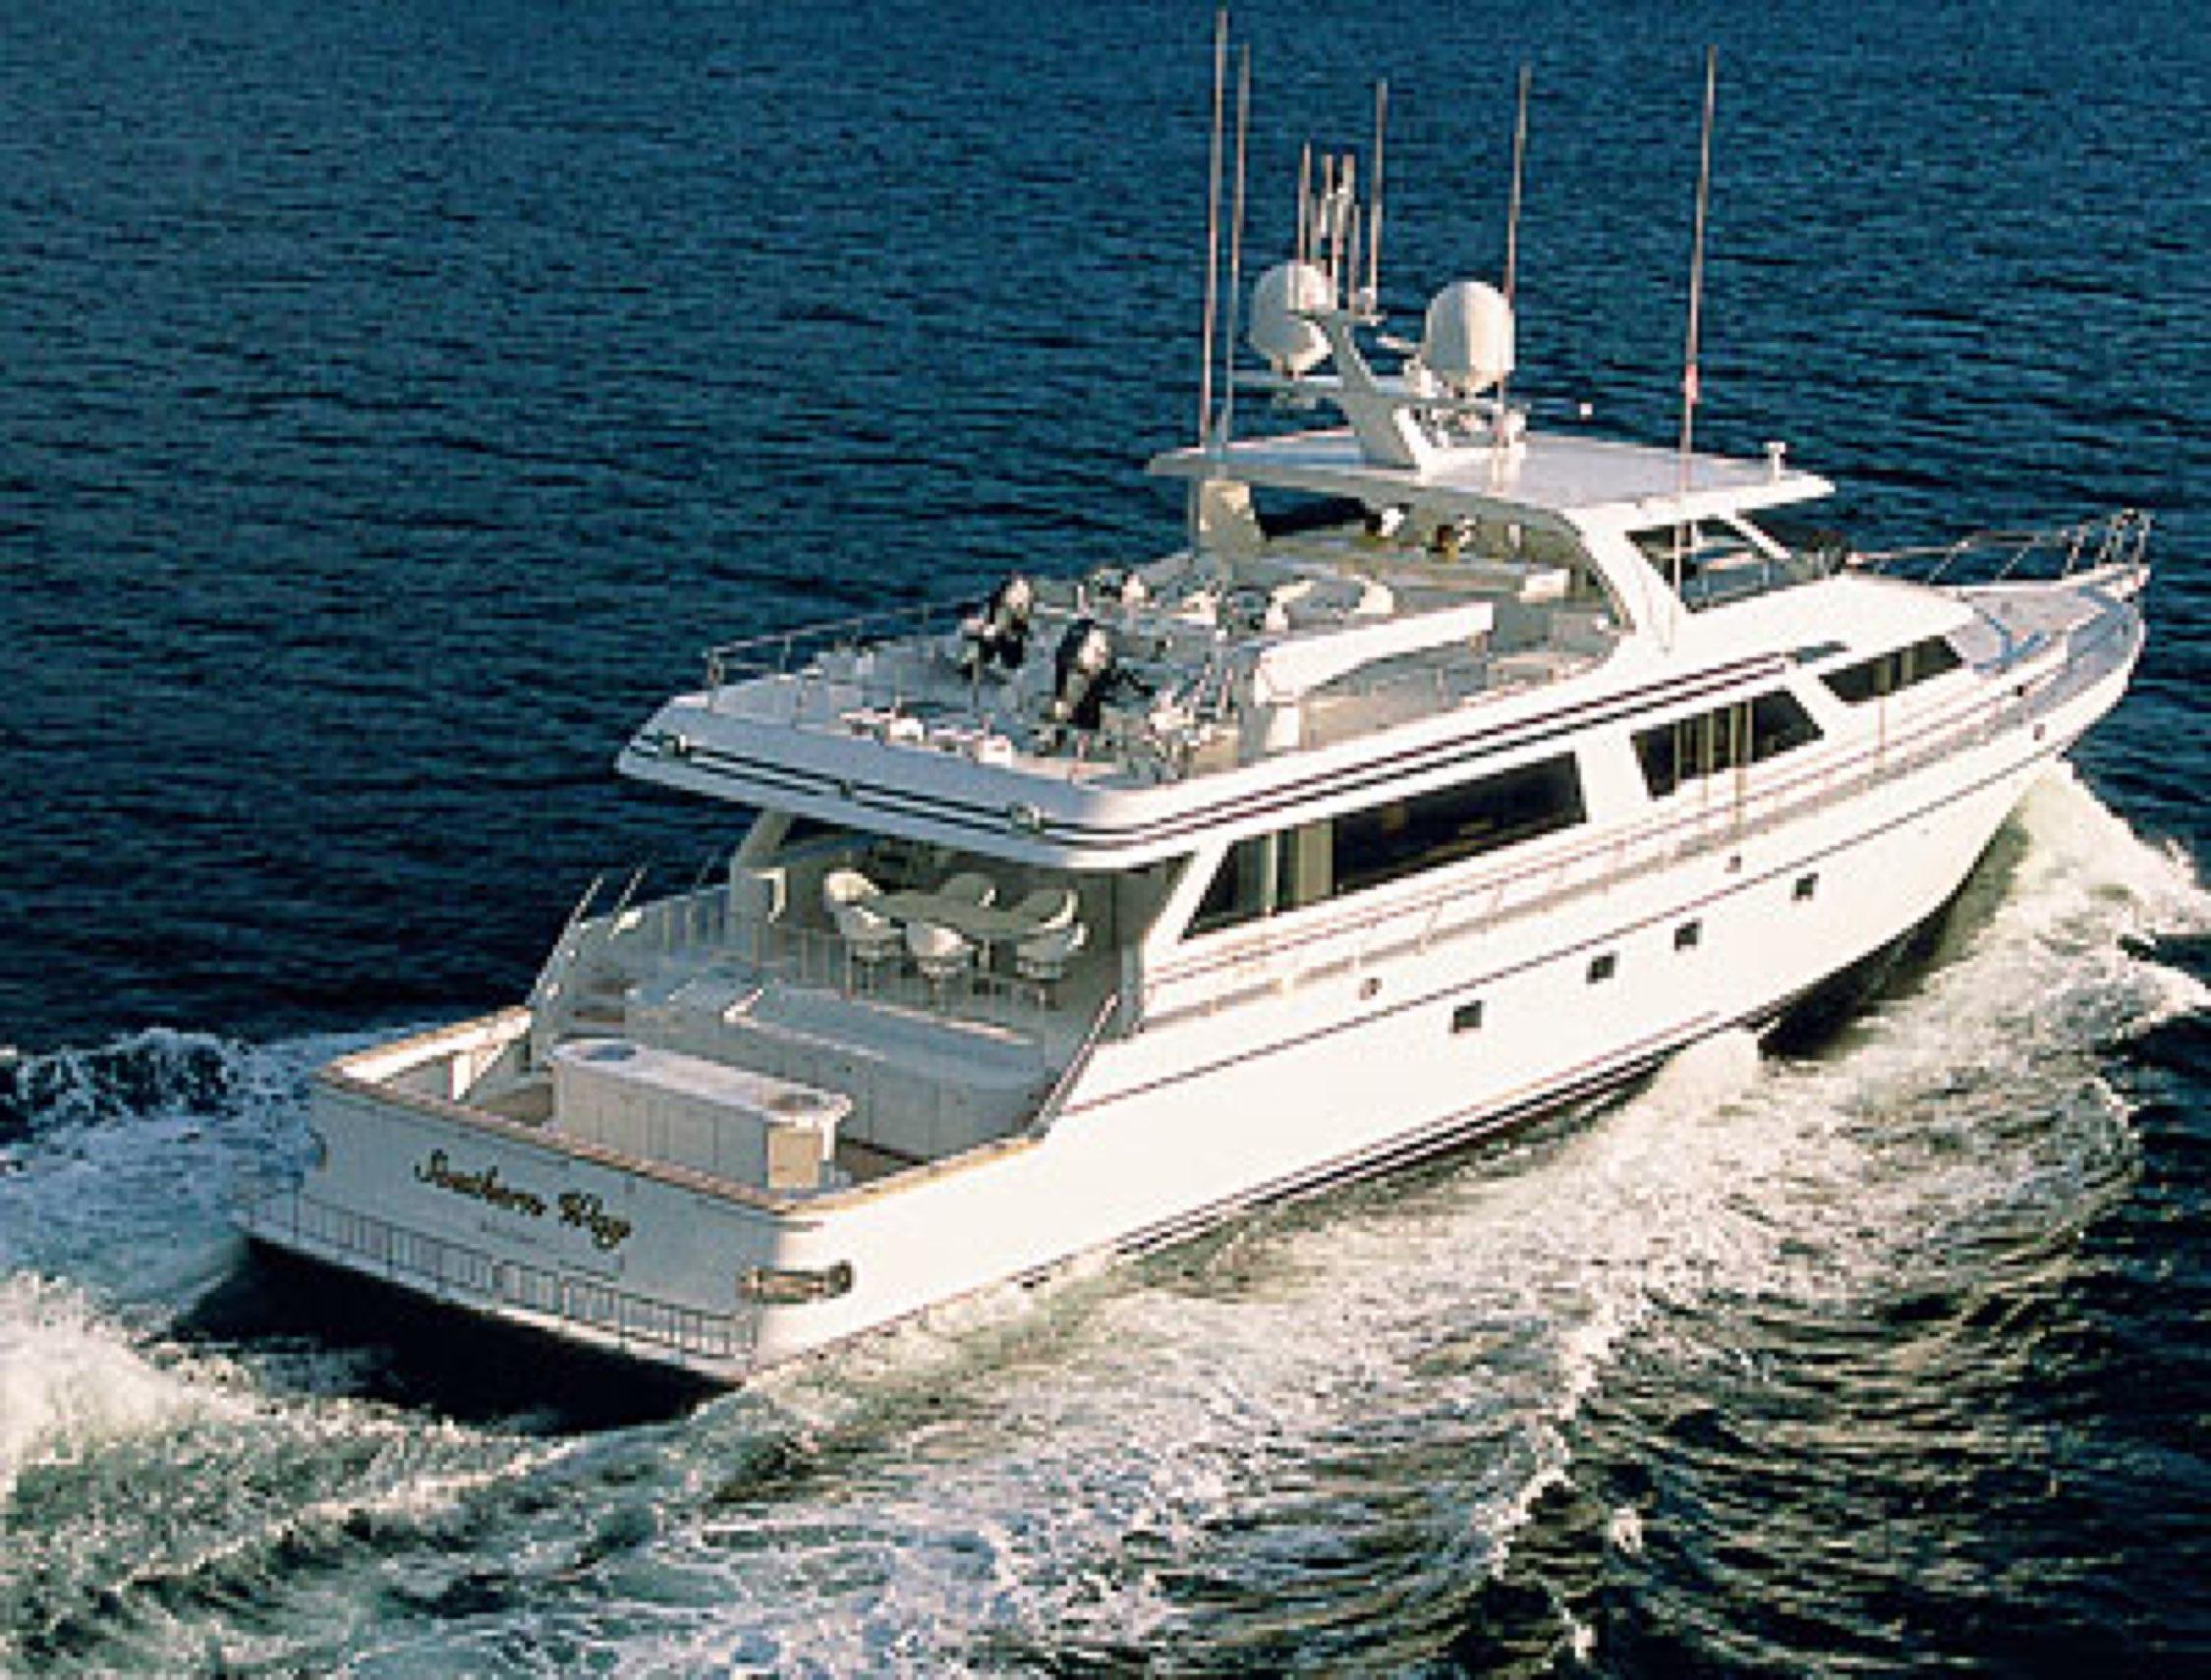 Southern-Way-Yacht-Studio-Lux-5